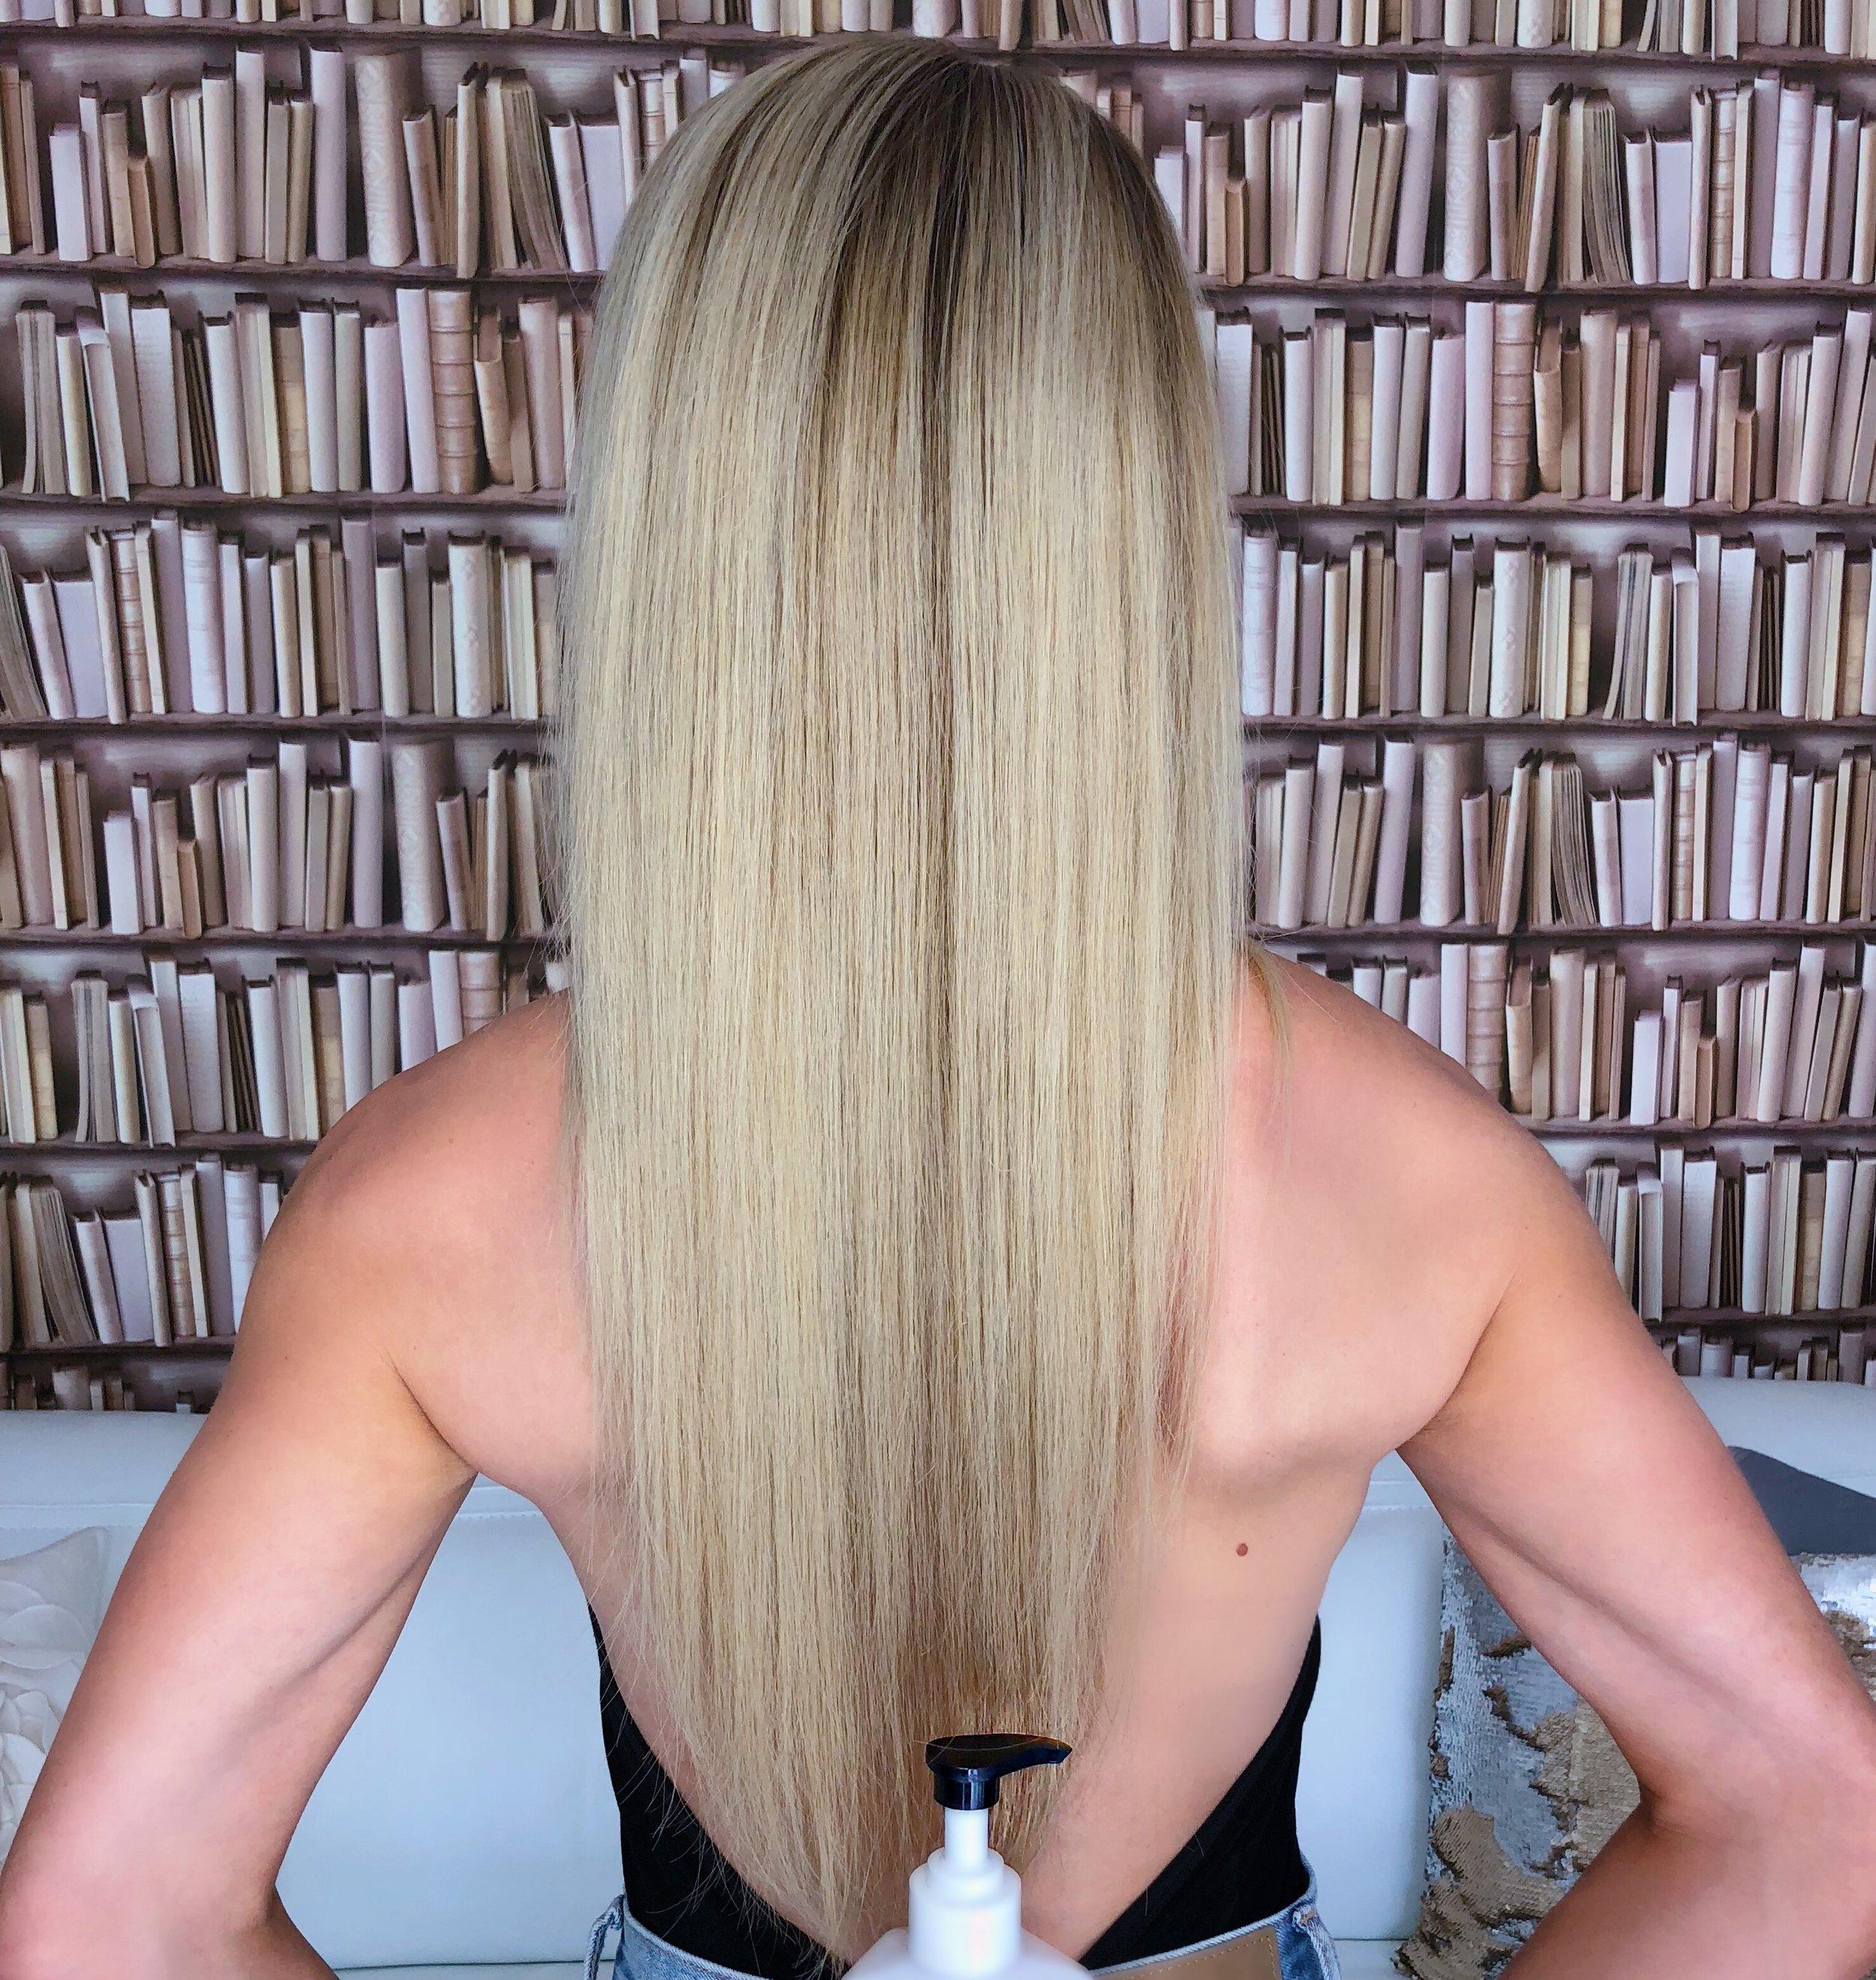 blonde-long-healthy-hair-eve-dawes.JPG